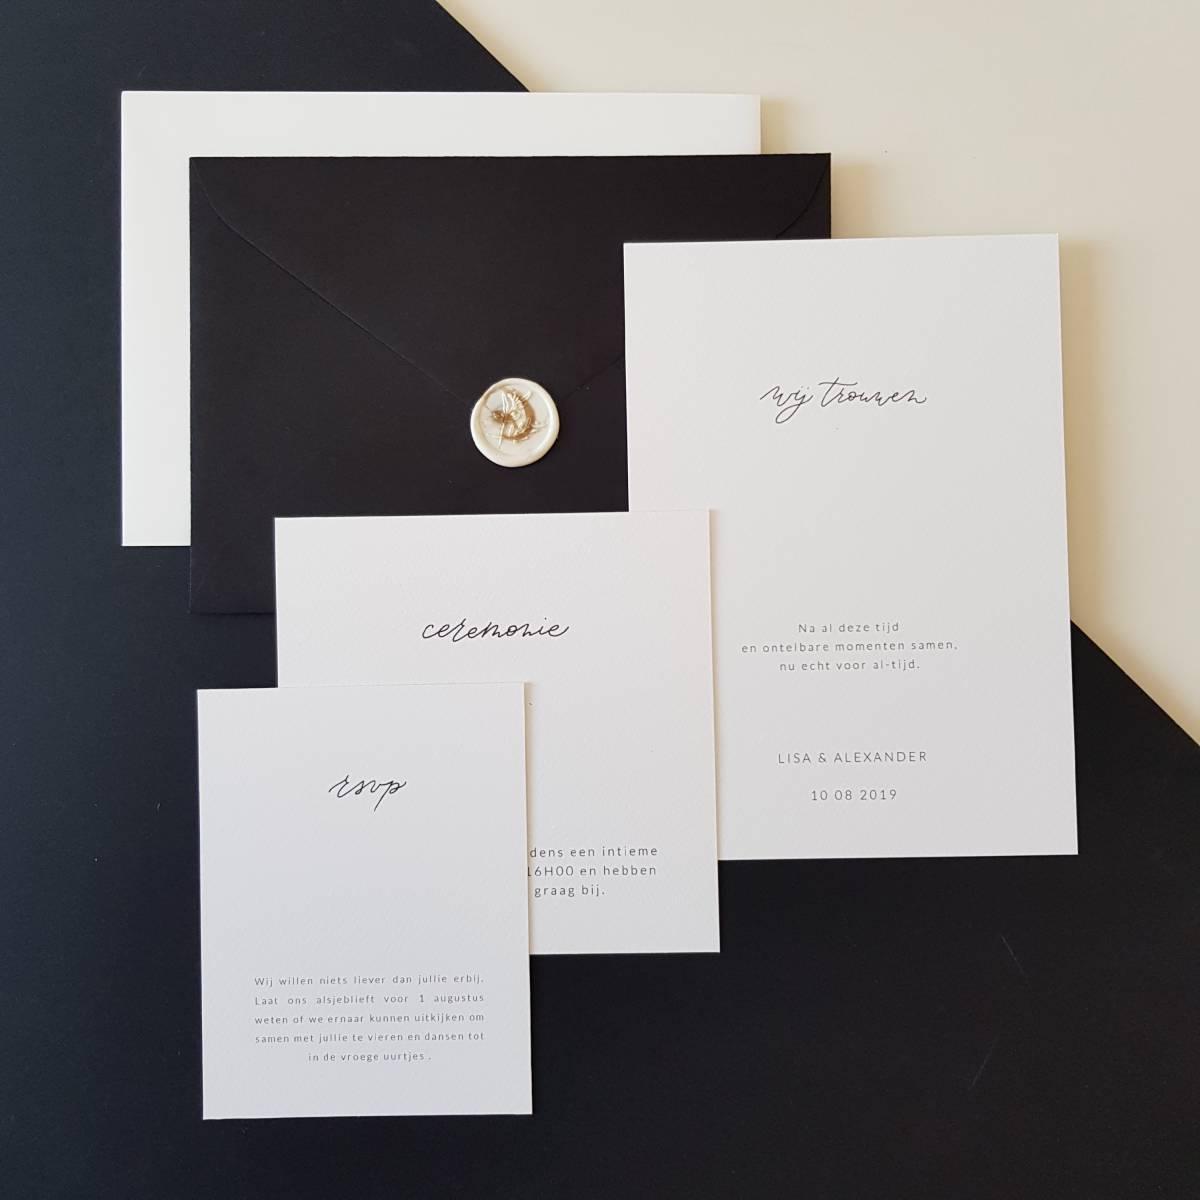 Touch of Gold - Trouwuitnodiging - Huwelijksuitnodiging - Kalligrafie - House of Weddings - 12